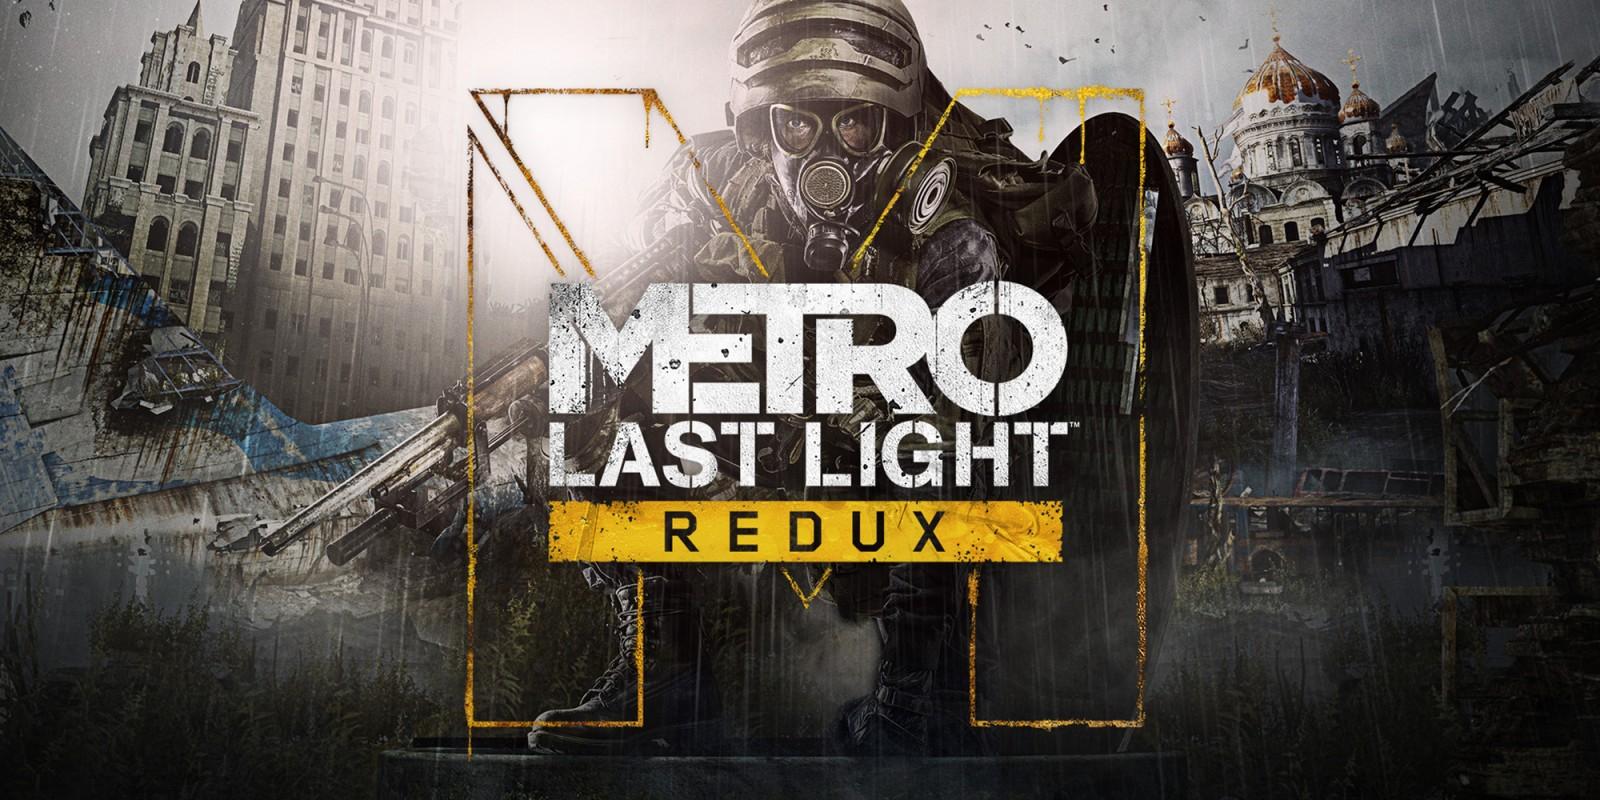 Metro: Last Light Redux for Nintendo Switch